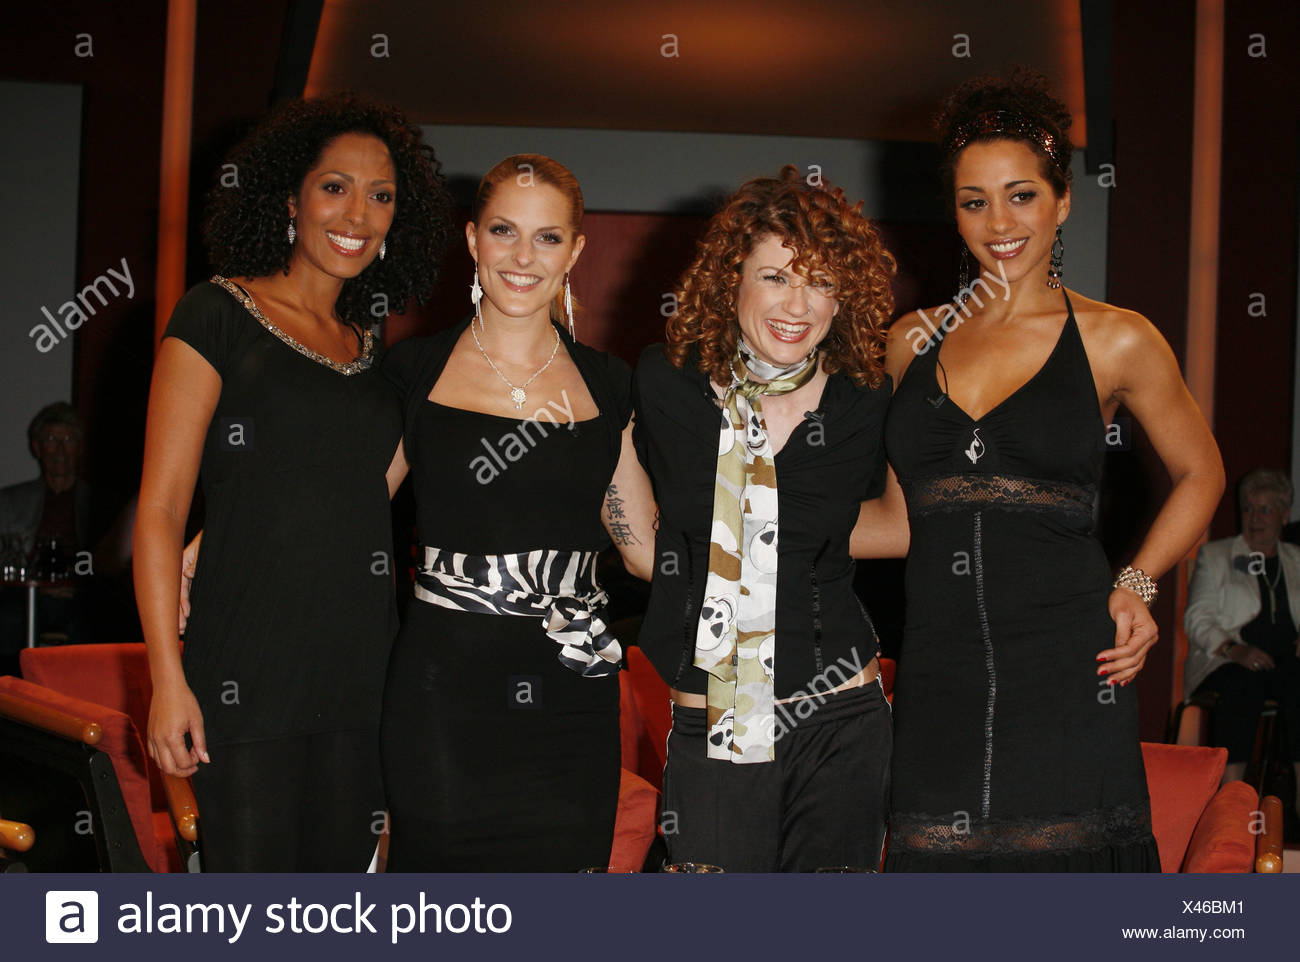 "No Angels, German pop group (pop music), founded: 2001, members: Nadja Benaissa, Ludmila Diakovska, Sandy Mölling, Jessica Wahls, half length, guests at TV show ""NDR Talk Show"", 5.4.2007, Additional-Rights-Clearances-NA Stock Photo"